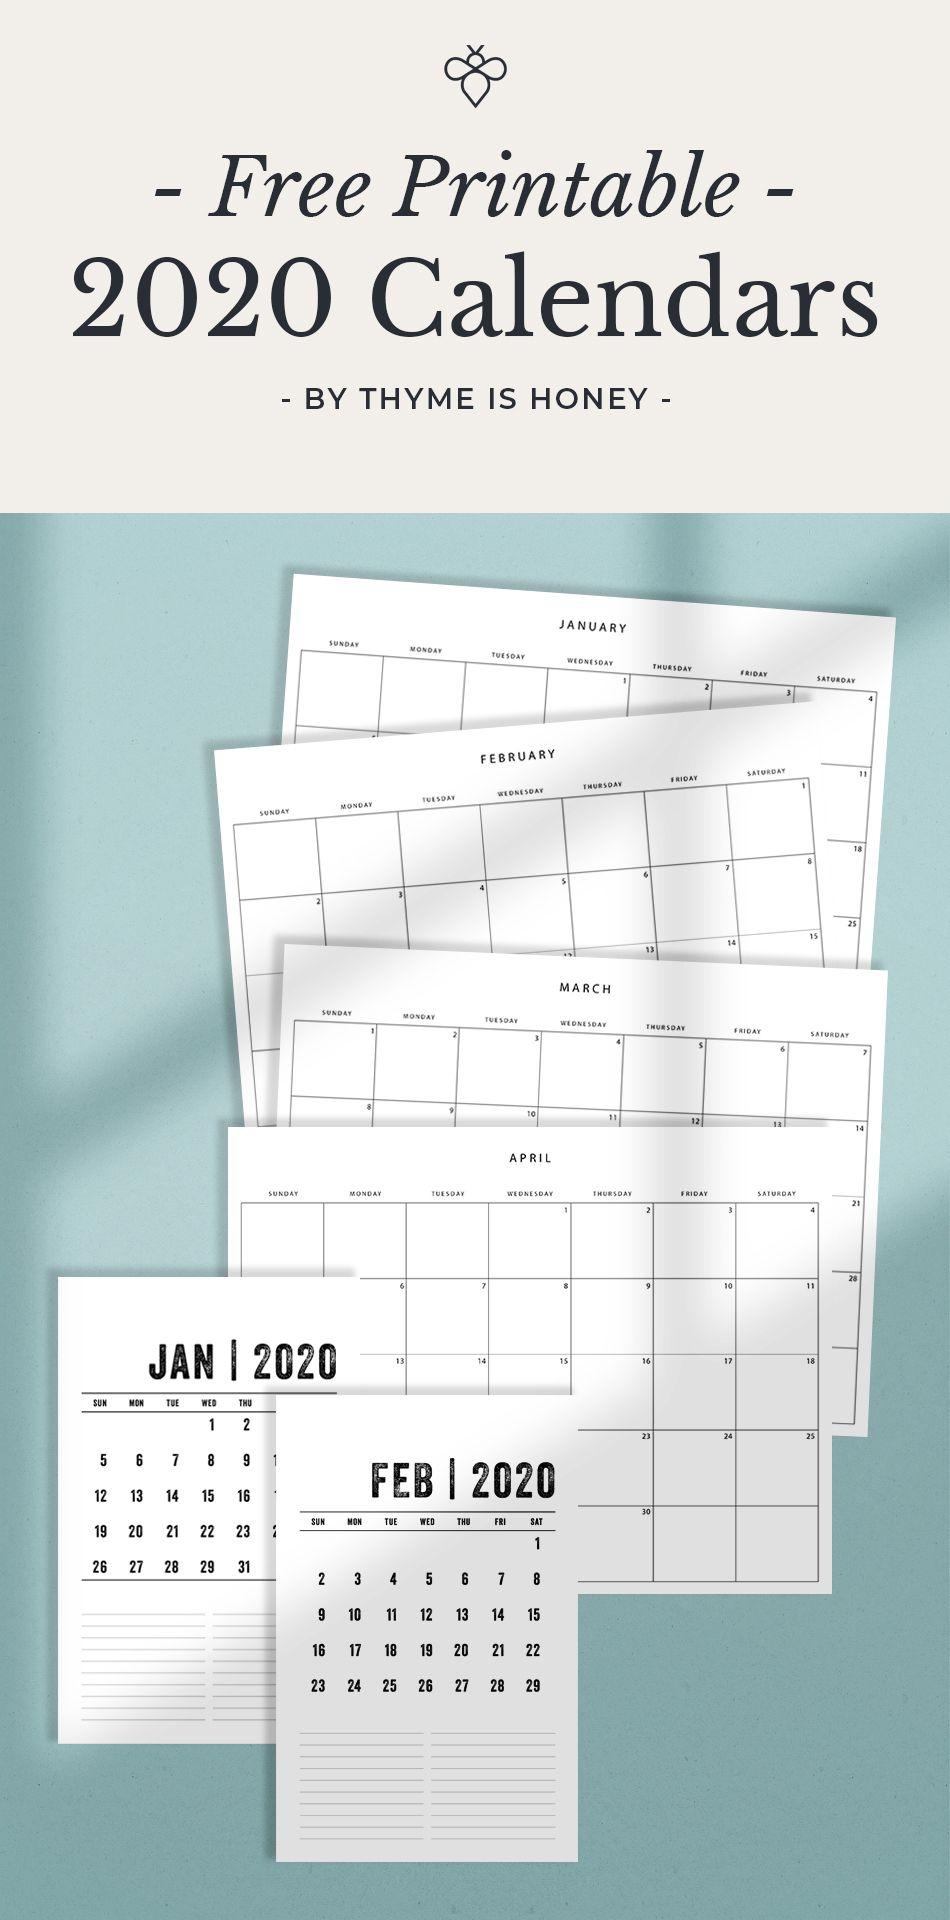 Free 2020 Calendars - Thyme Is Honey